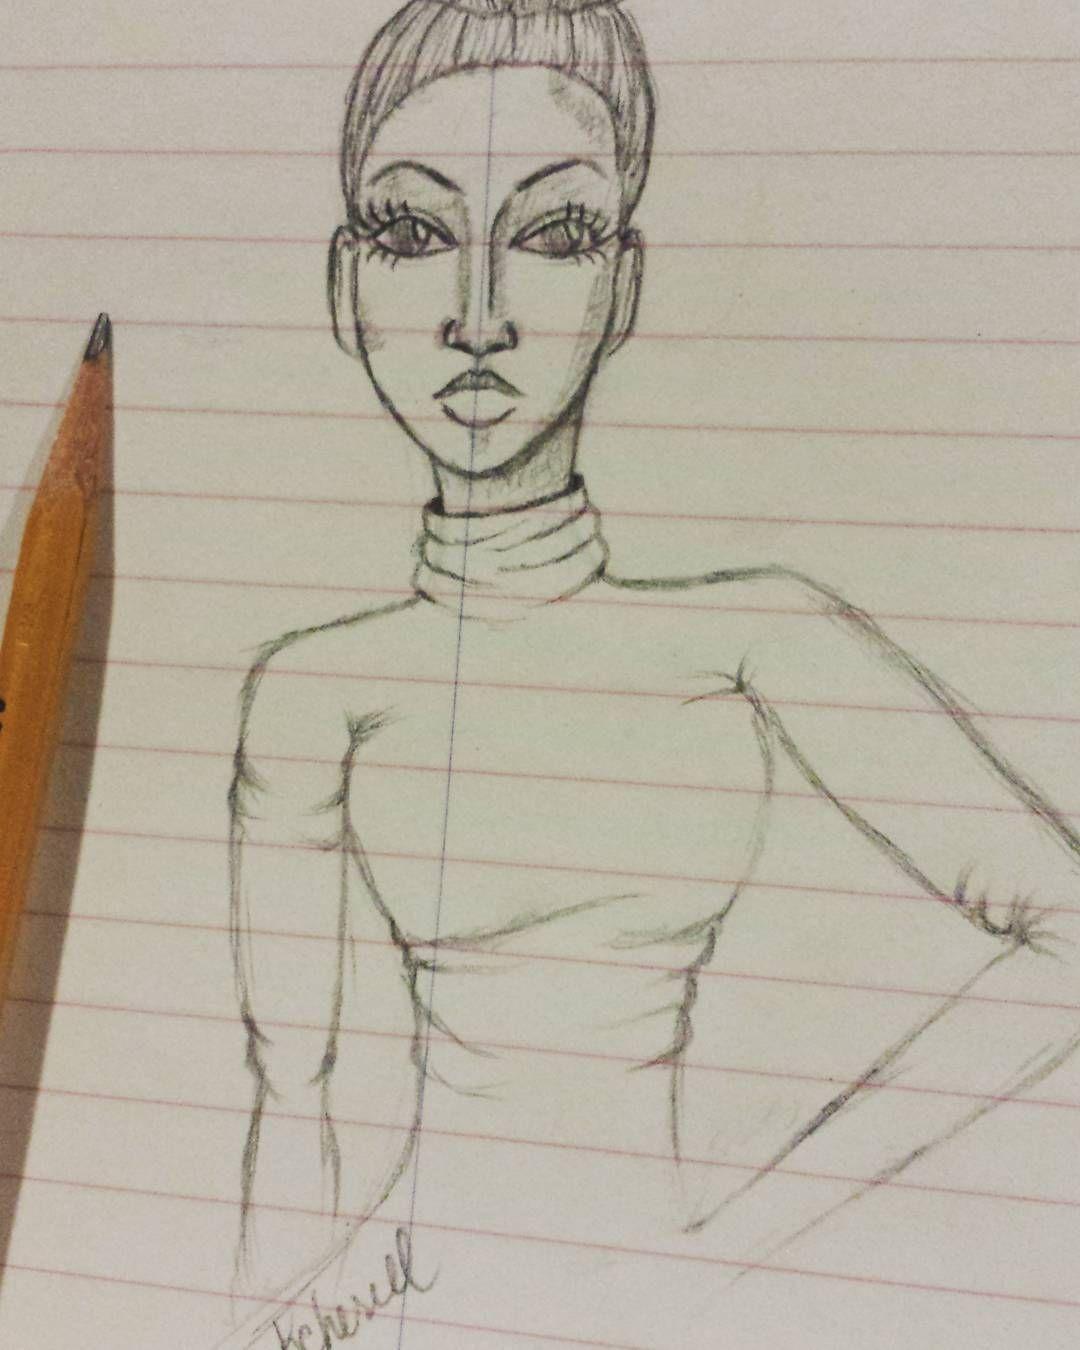 """by kcherell designs #sketching #illustration #sketch #fashion #fashionsketches #fashionillustrator #fasionillustration #illustration #illustrator #art #style"""